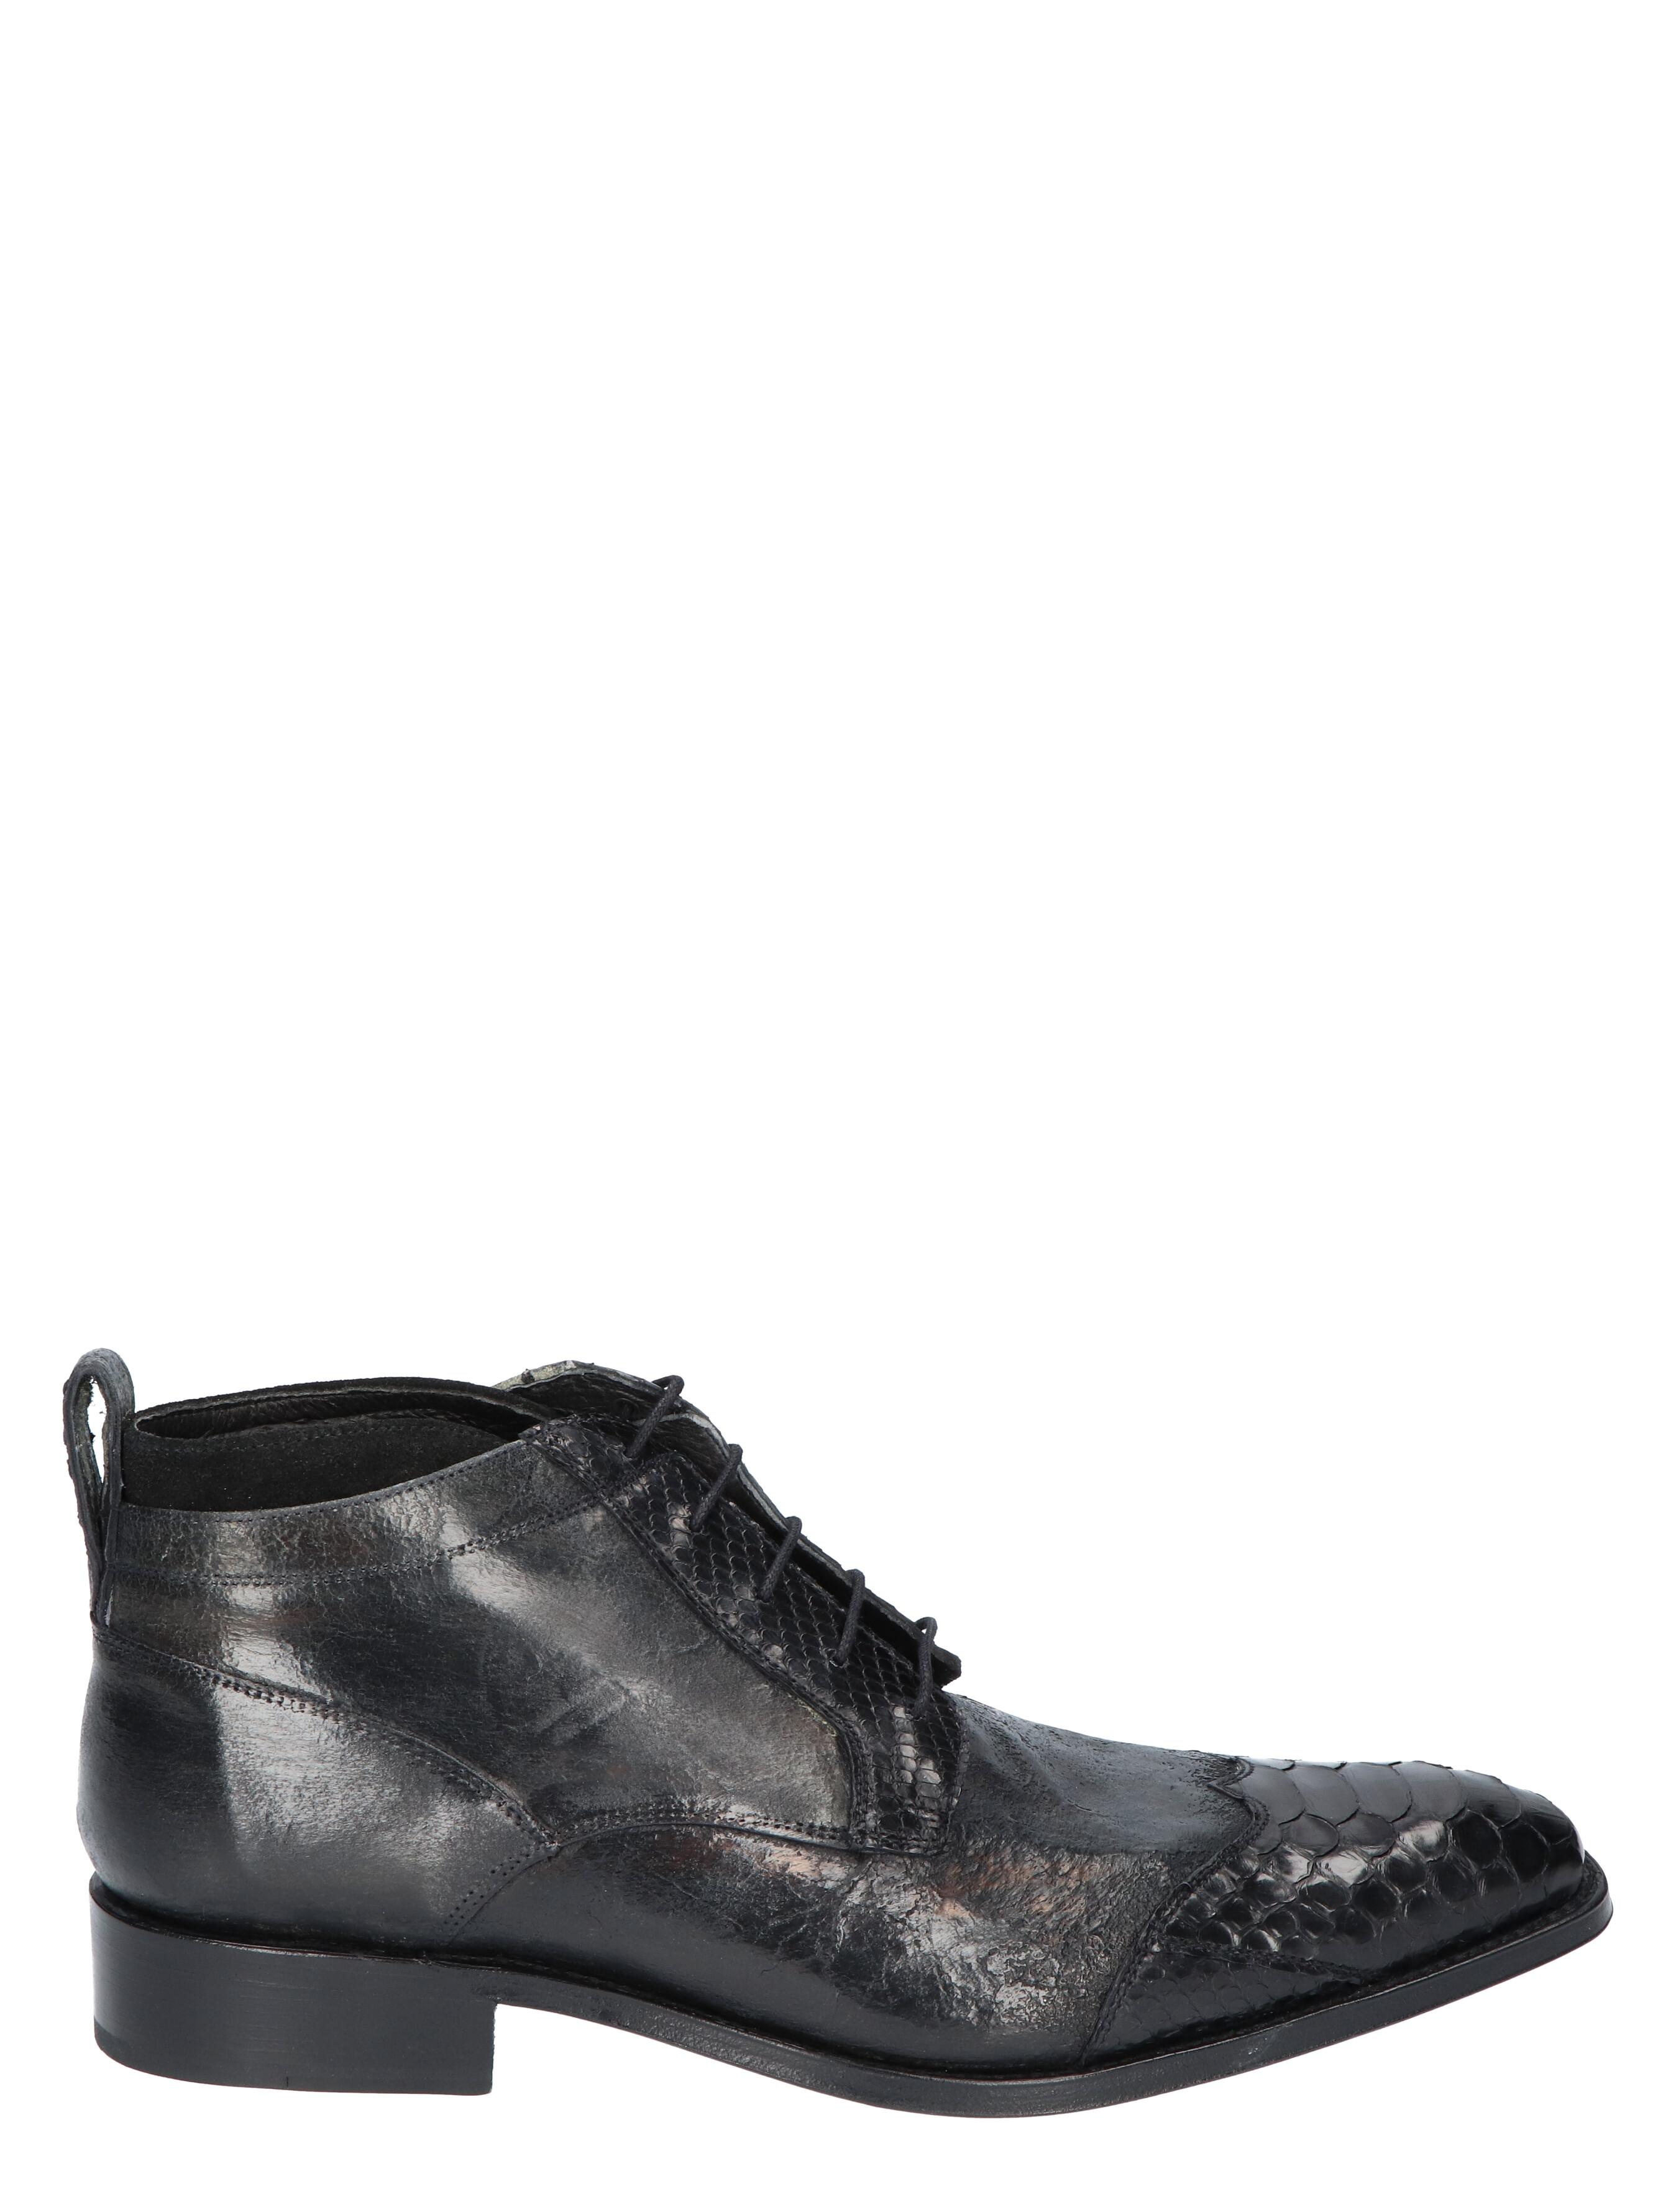 Sendra 10955 Piton Barr Negro Veter boots